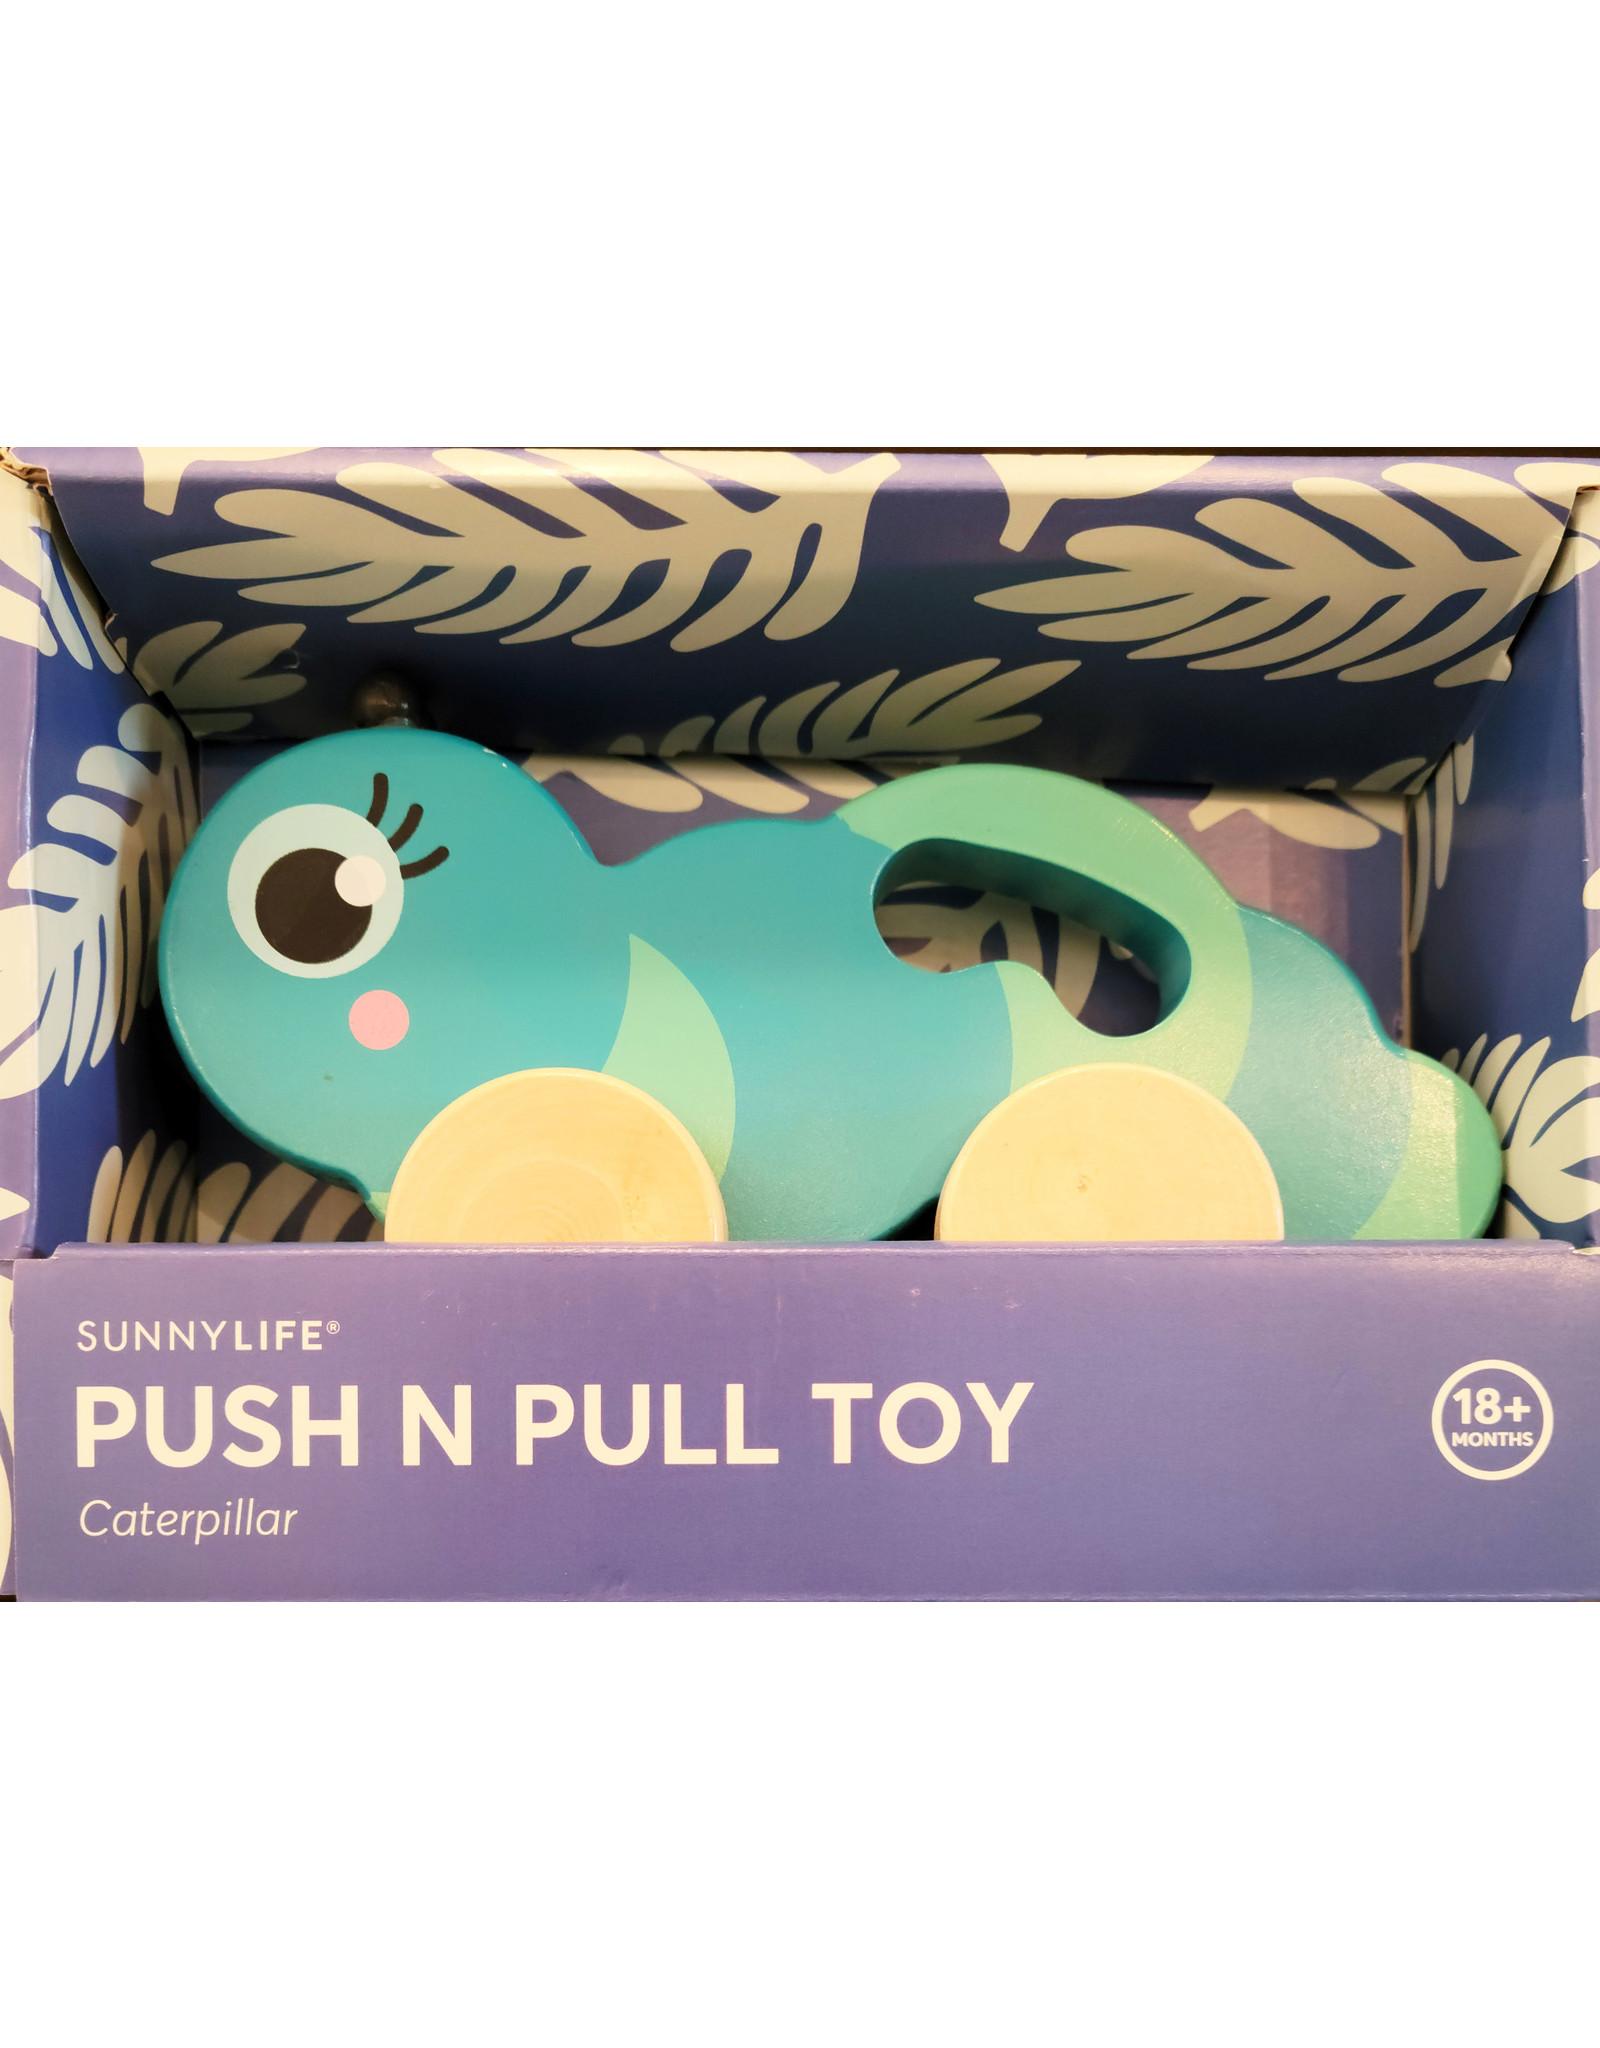 Push n Pull Caterpillar Toy